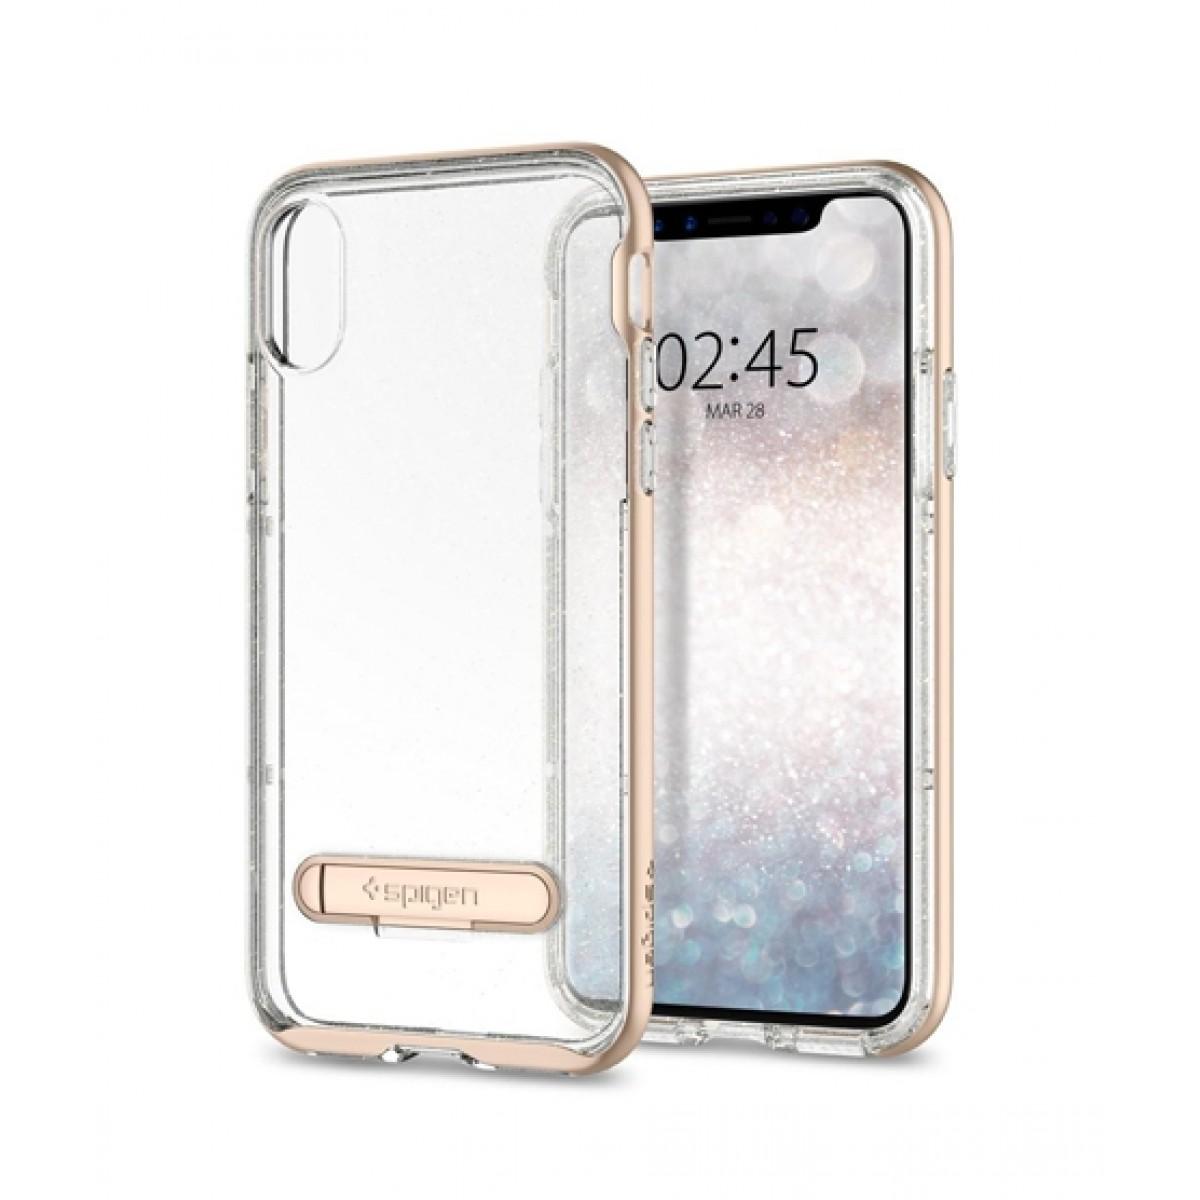 low priced c1cc1 ccdd1 Spigen Crystal Hybrid Glitter Gold Quartz Case For iPhone X/XS